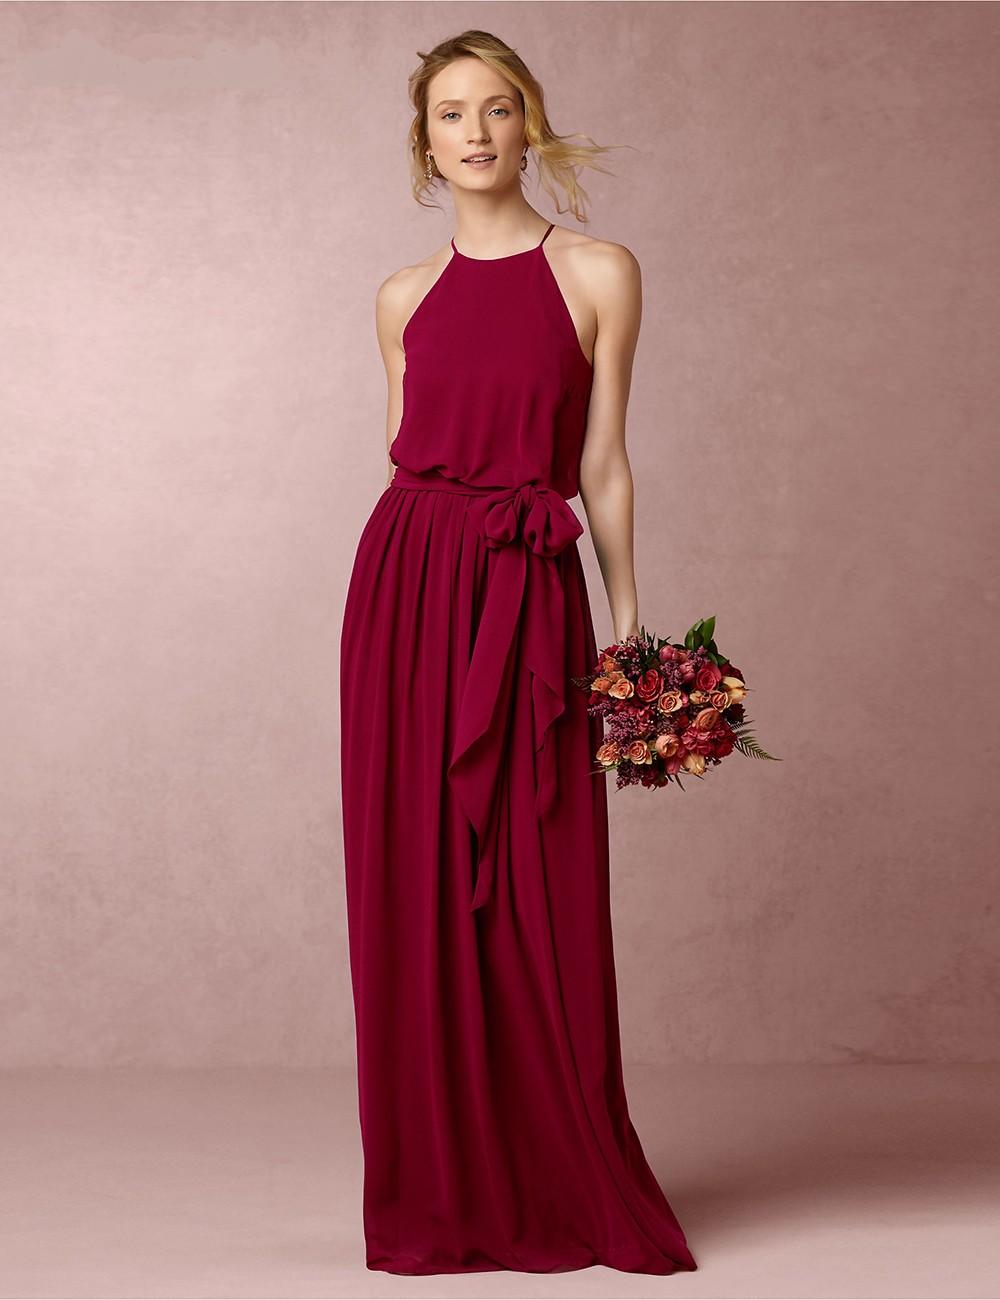 Elegant halter wine red floor length made maid of honor bridesmaid